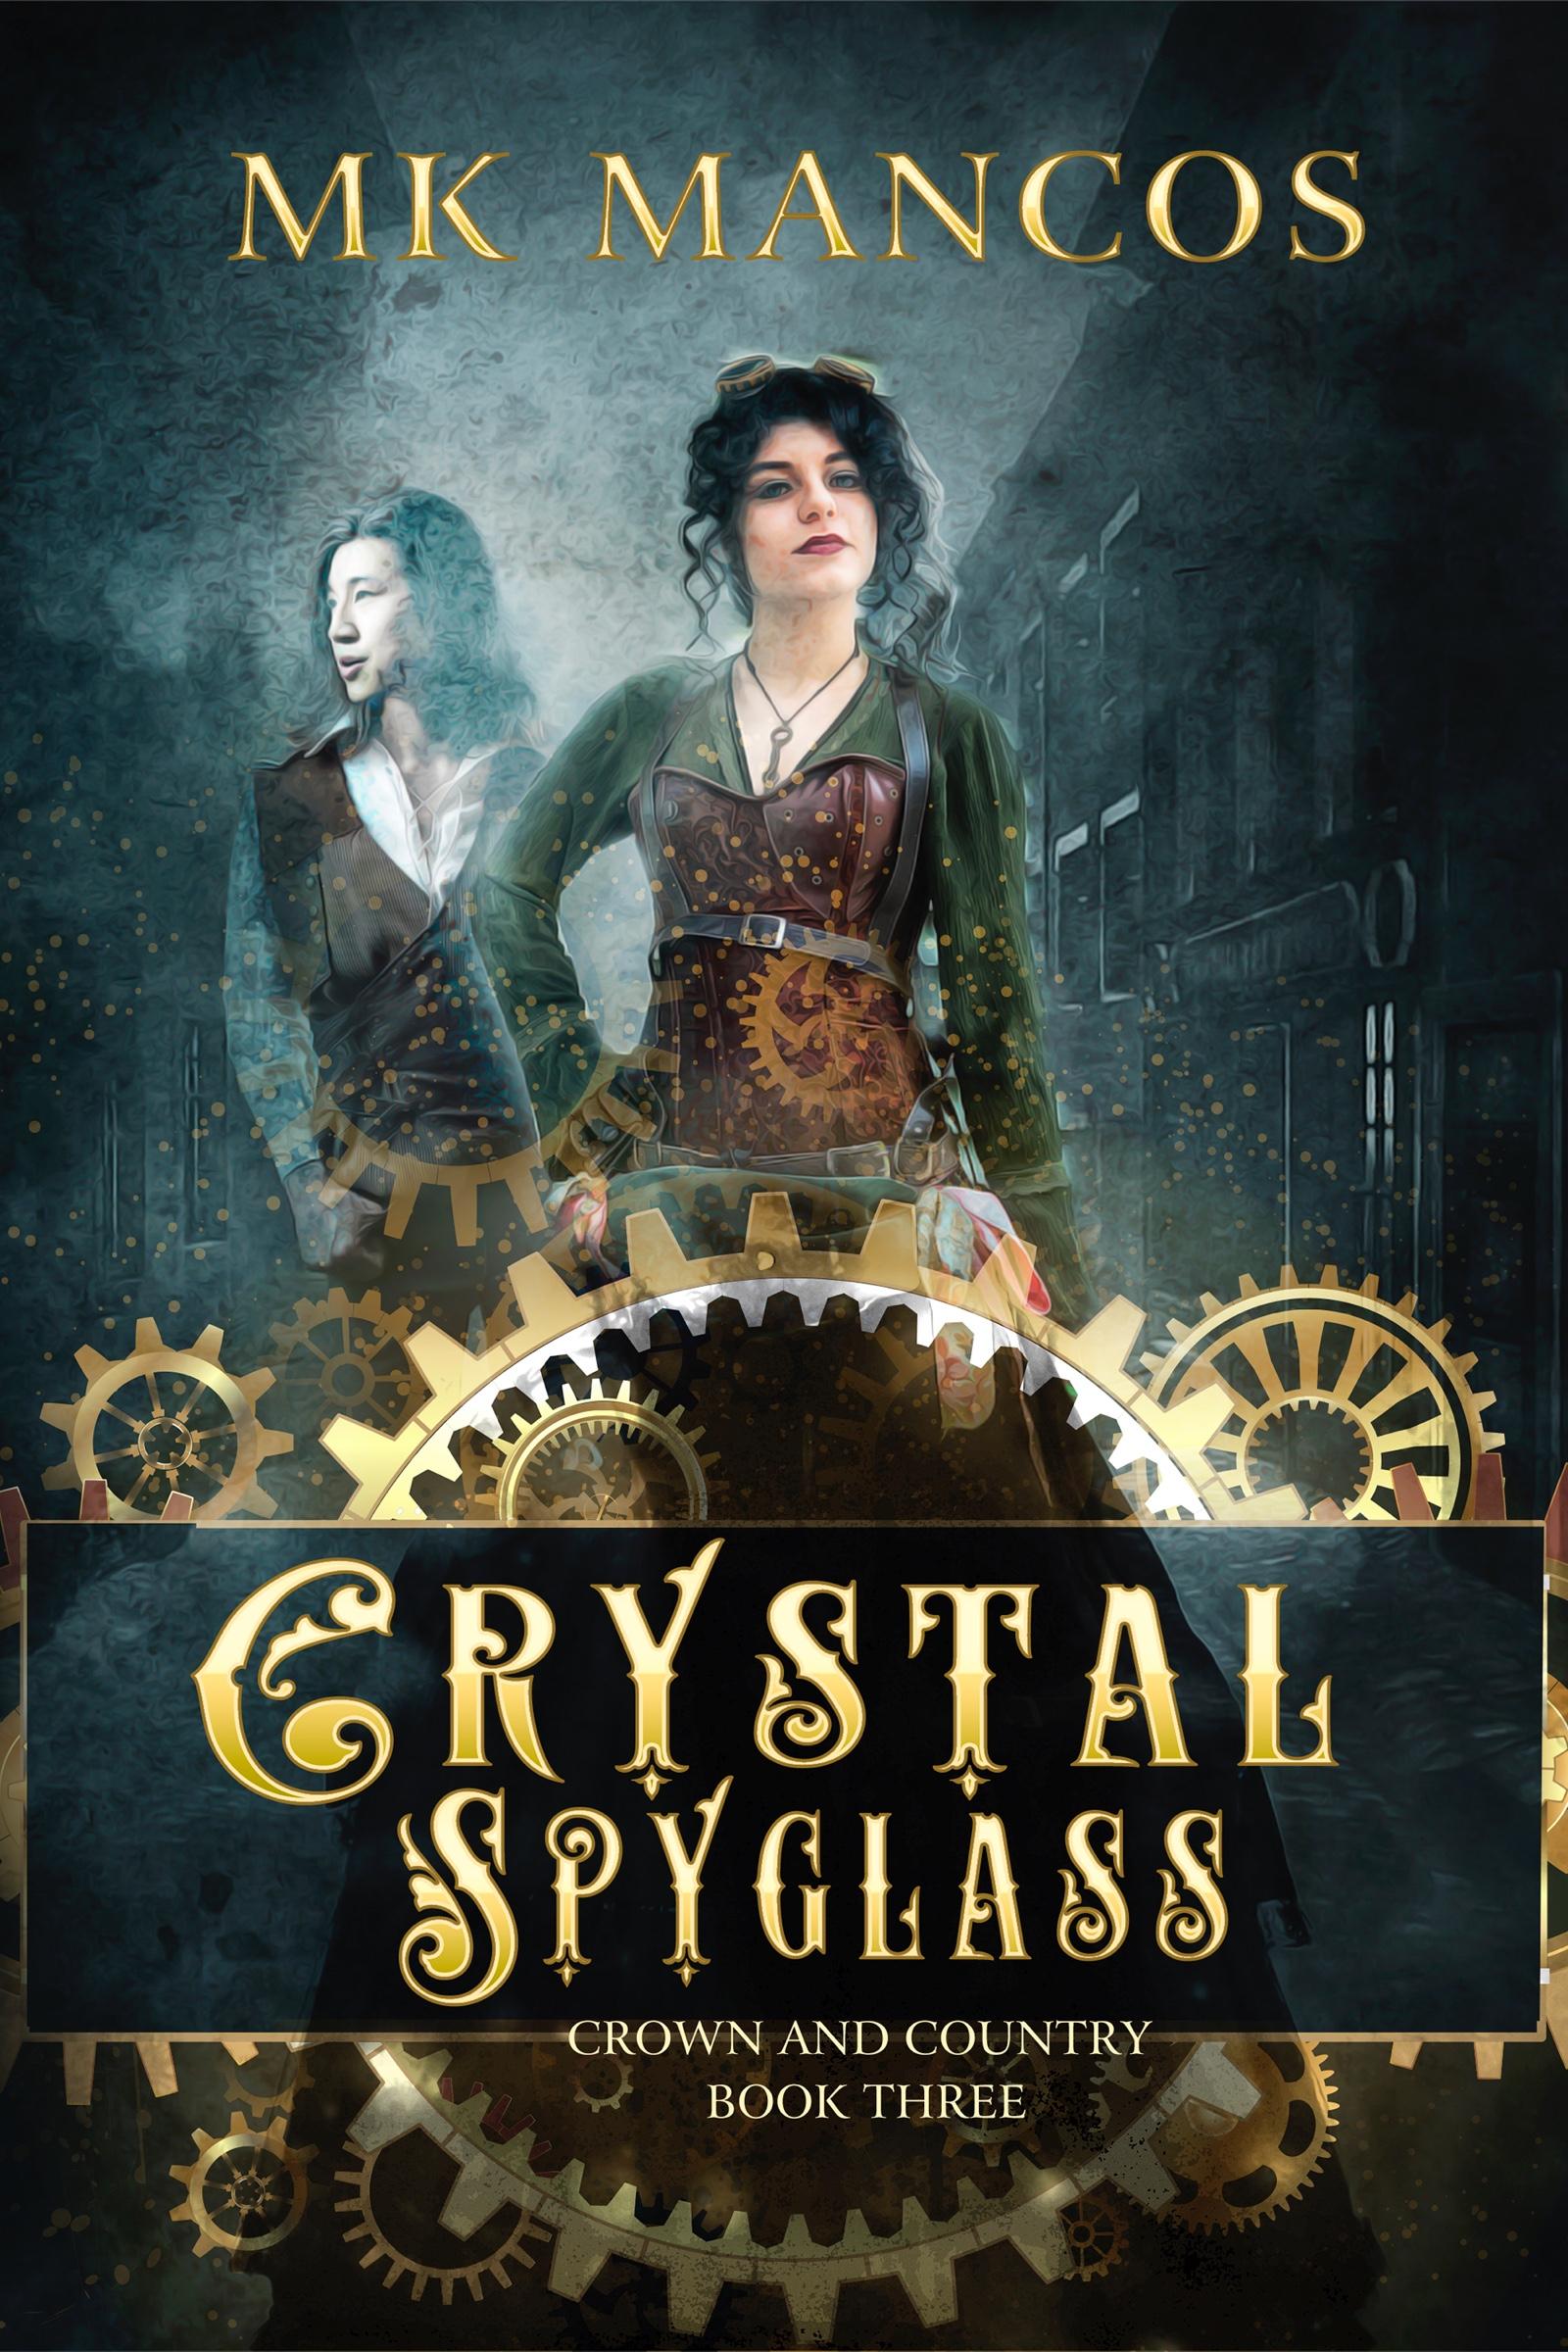 CrystalSpyglassFinal-FJM_Smashwords_1600x2400